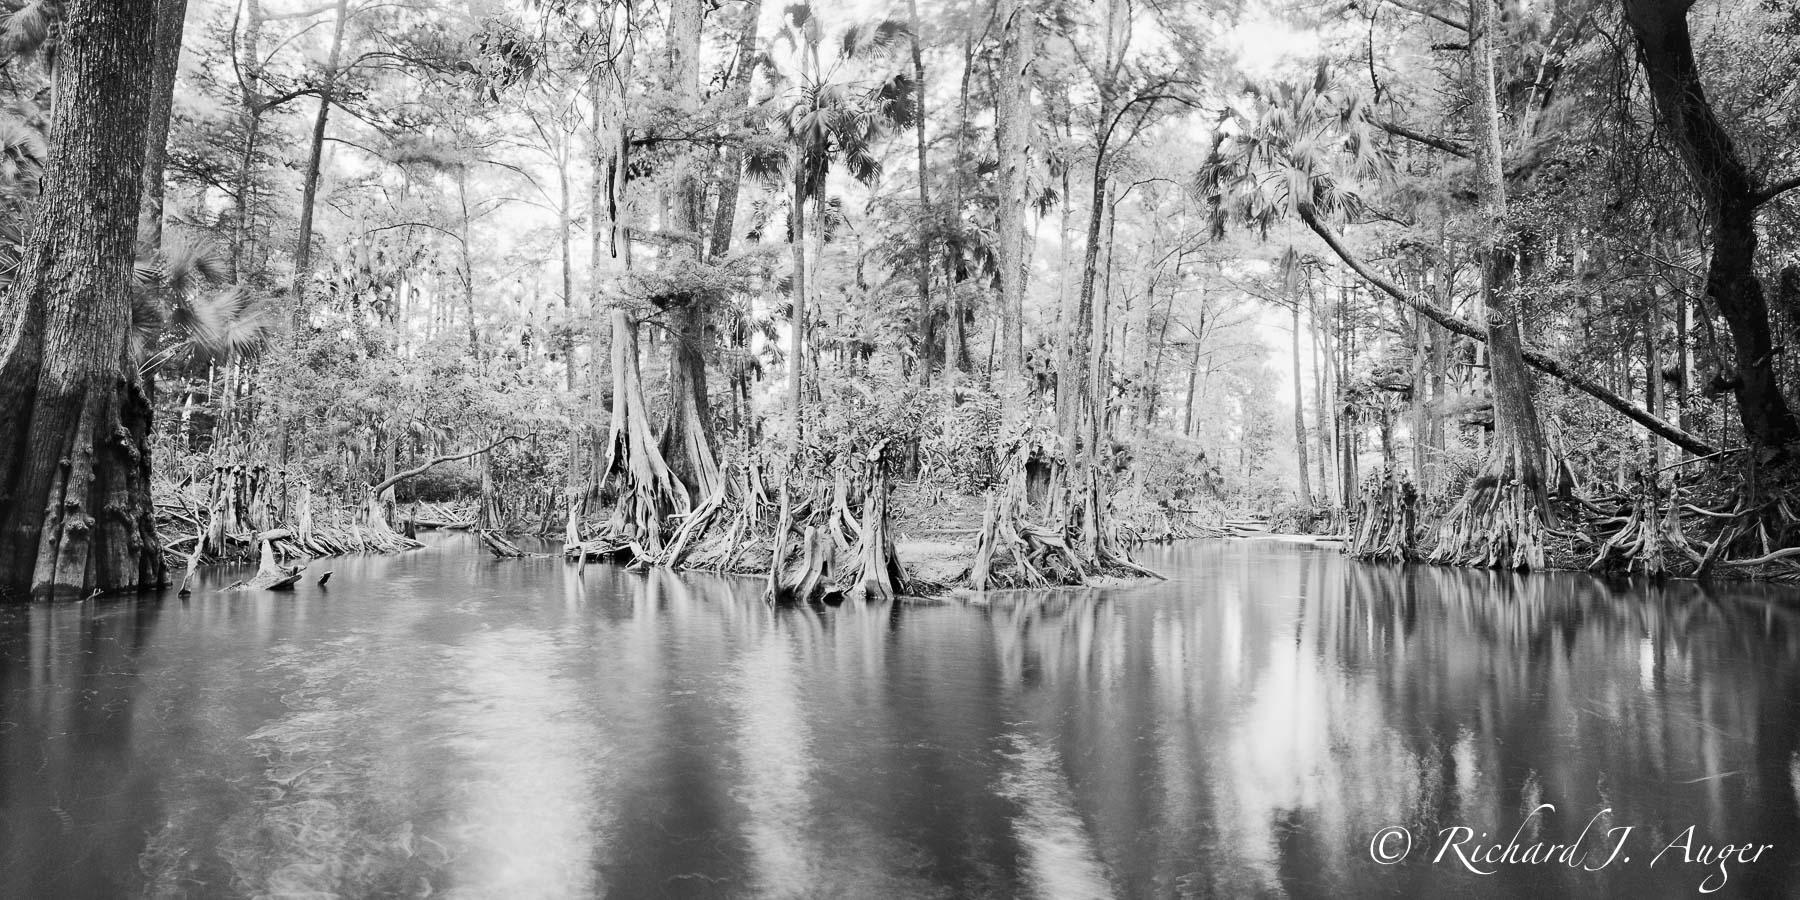 Loxahatchee river, Florida, Swamp, Cypress, Monochrome, Black and White, Photograph, River